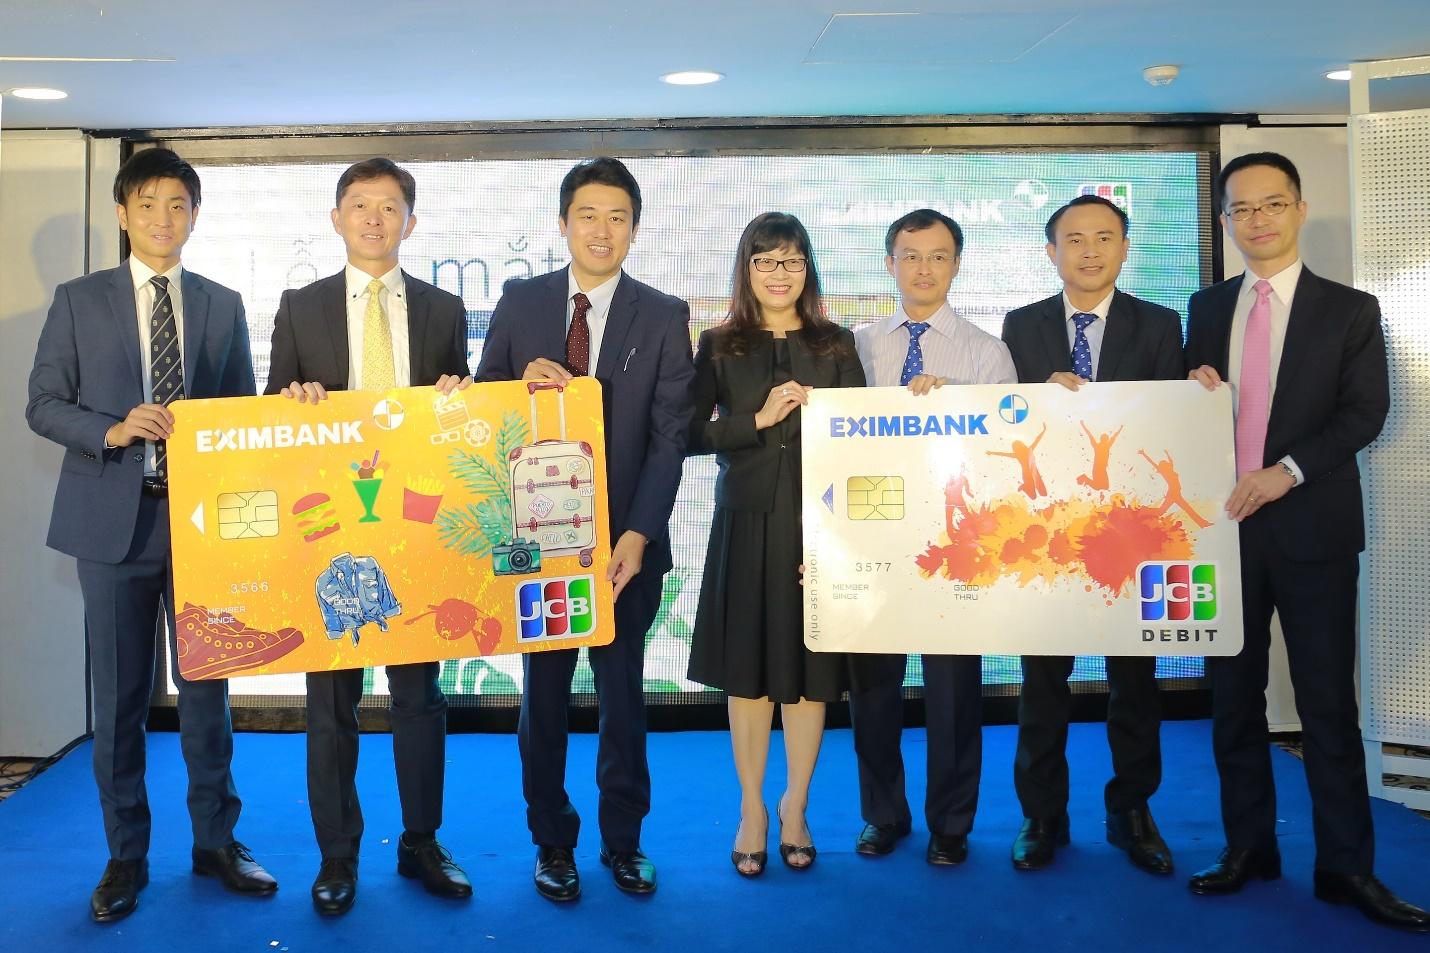 Eximbank ra mắt thẻ quốc tế Eximbank JCB Young Card - Ảnh 2.